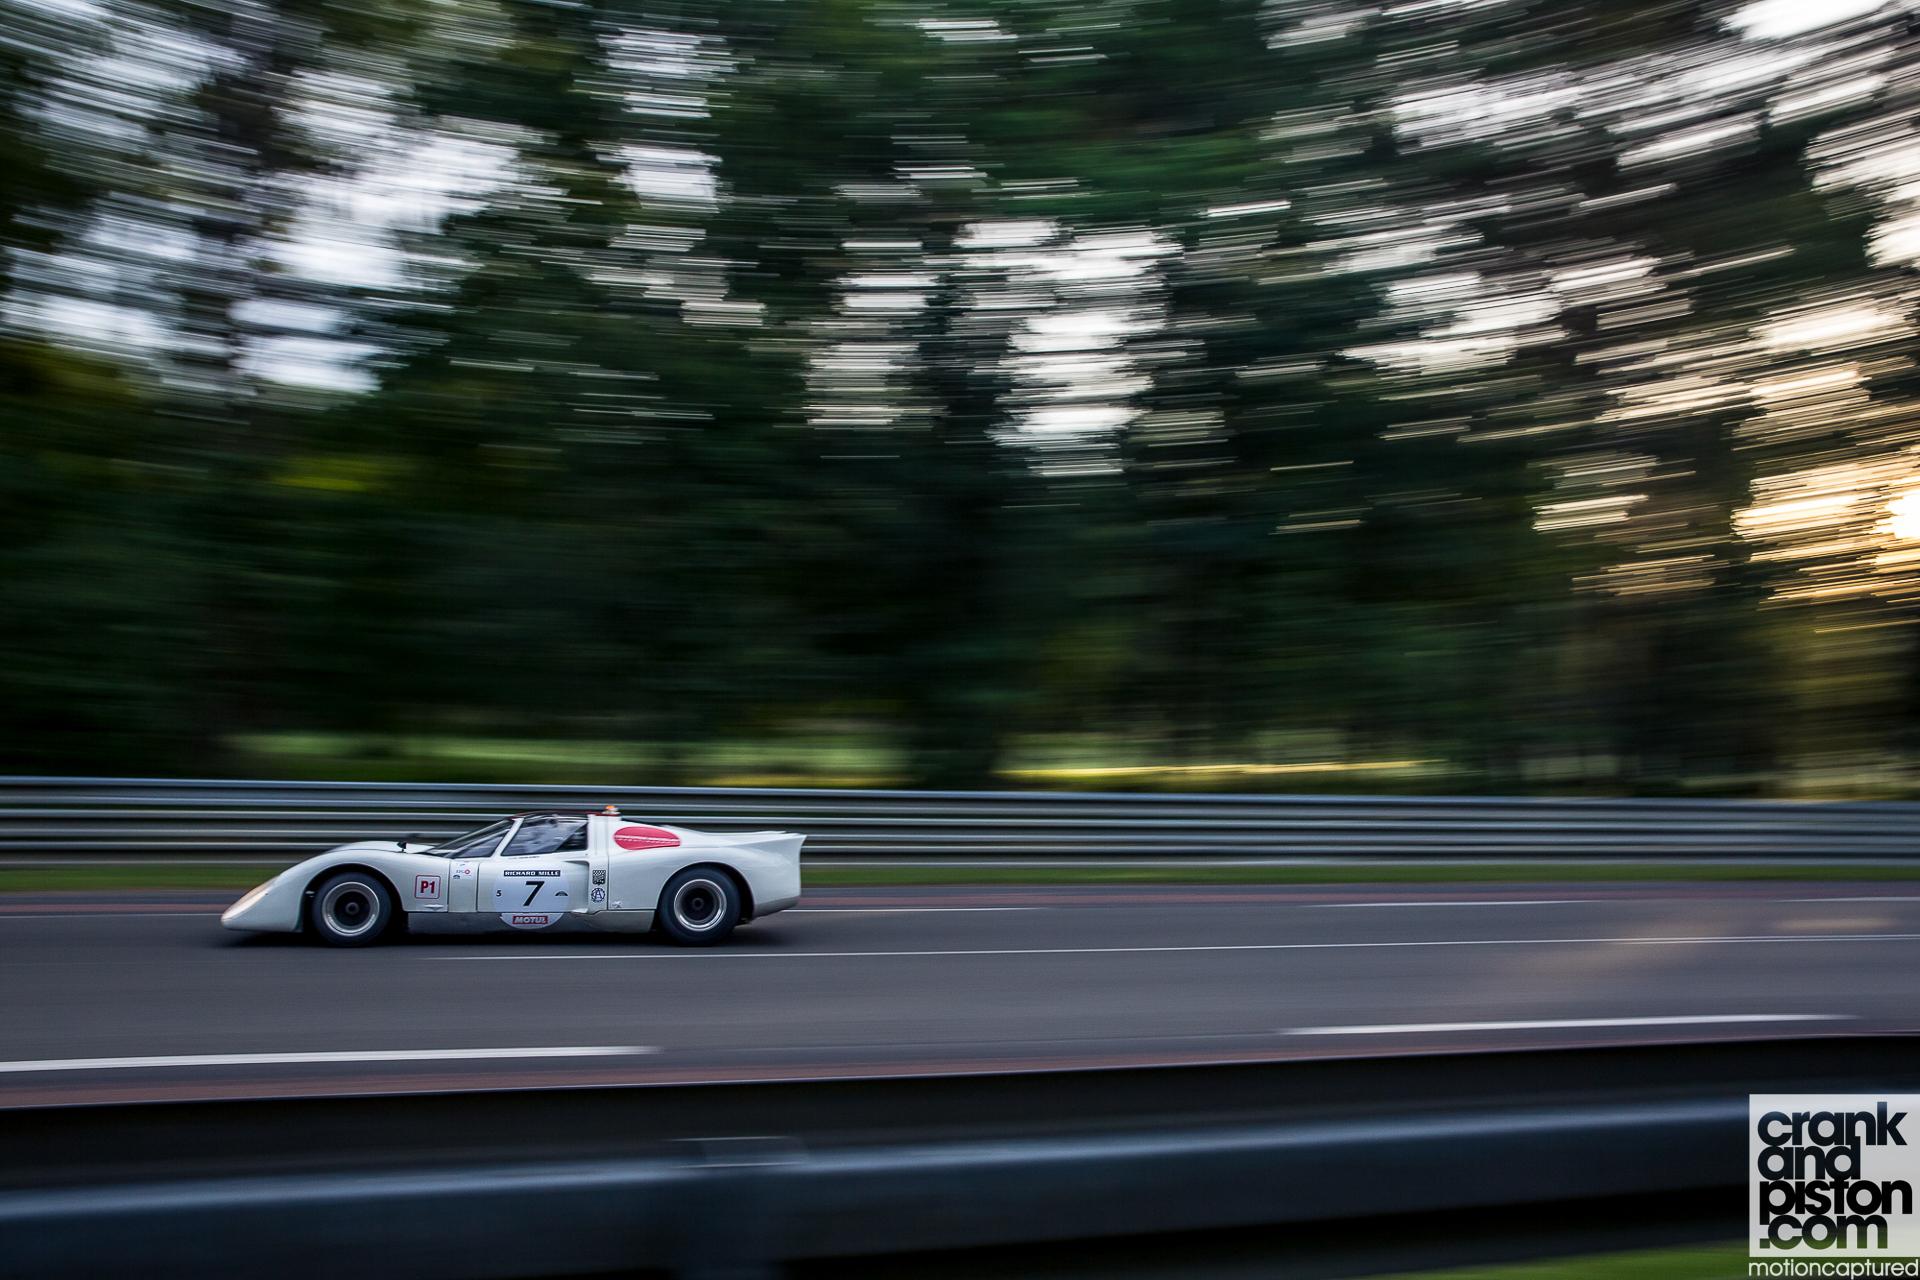 2016 Le Mans Classic crankandpiston Wallpapers-12